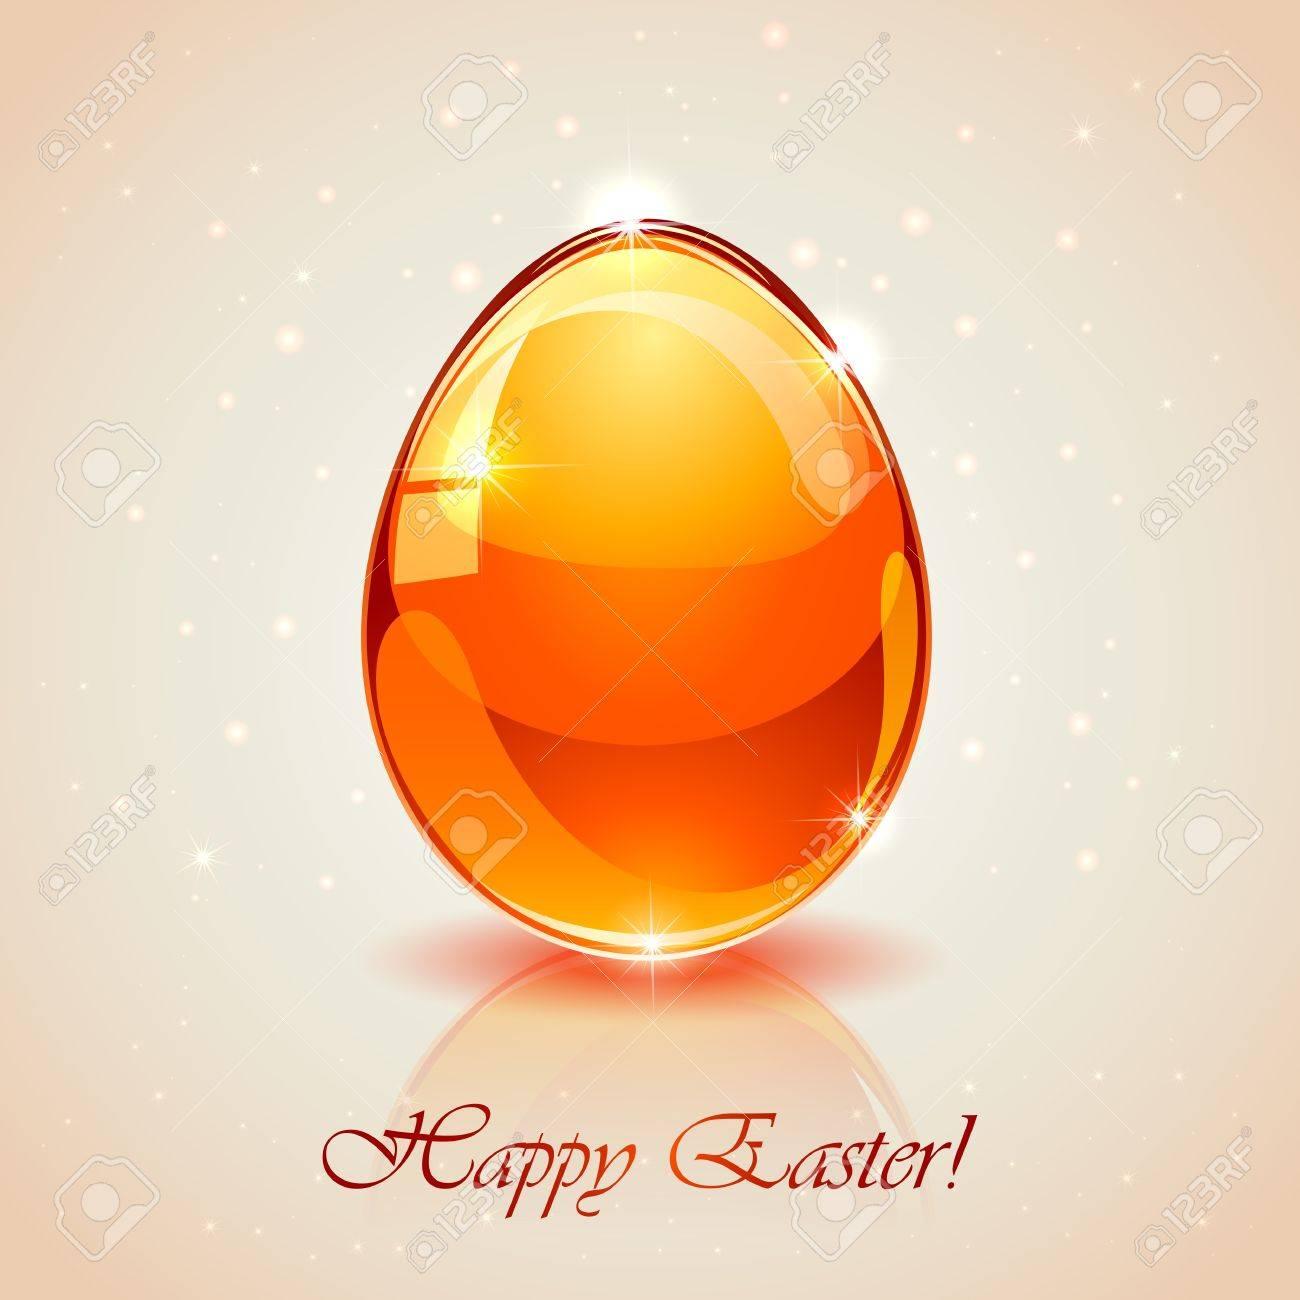 Glass Easter egg on pink background, illustration. Stock Vector - 18764601